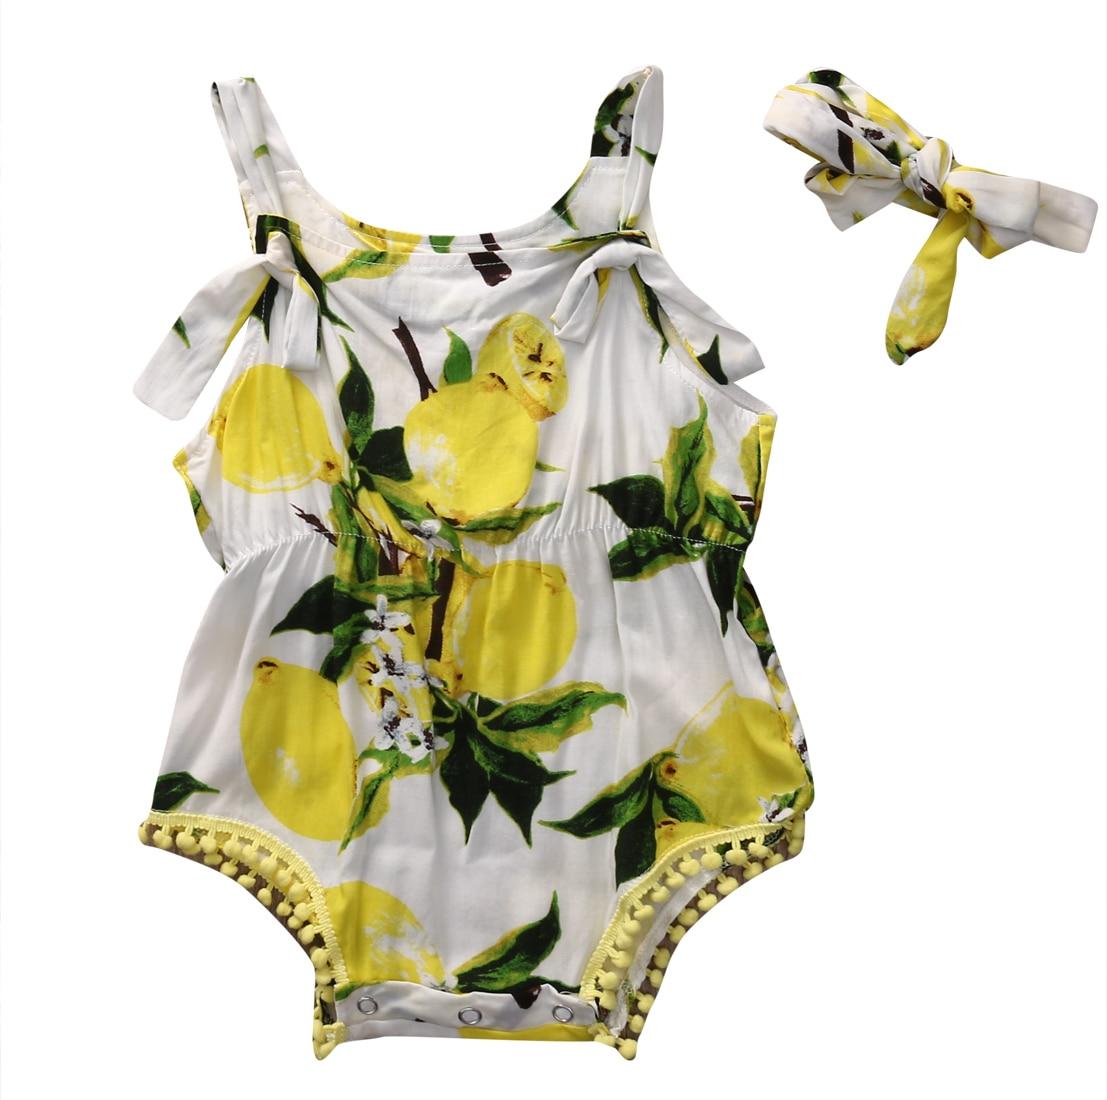 2PCS Newborn Infant Baby Girl Floral Tassel Bodysuit Romper+ Headband Outfit Set Bebek Giyim Children Clothes Set  недорого